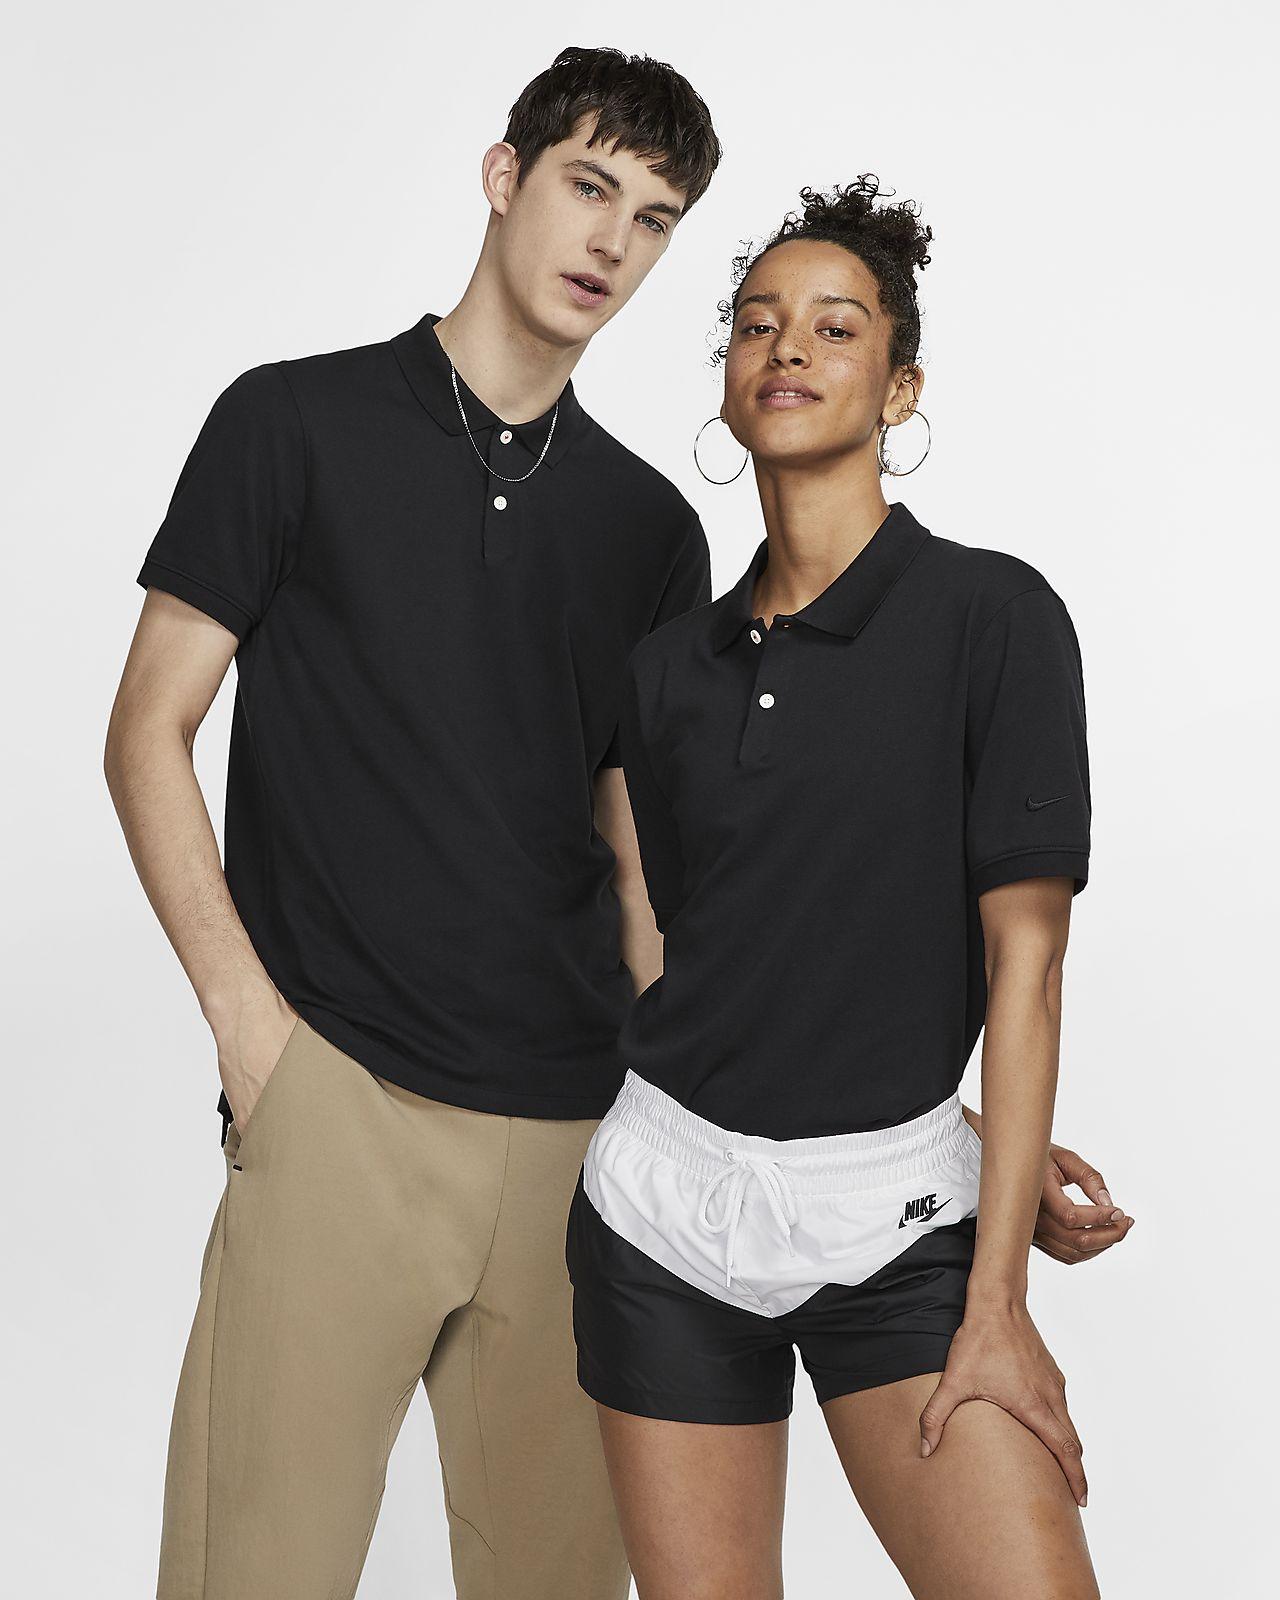 The Nike Polo Herren-Poloshirt in schmaler Passform (ohne orangefarbenem Kragenlabel)